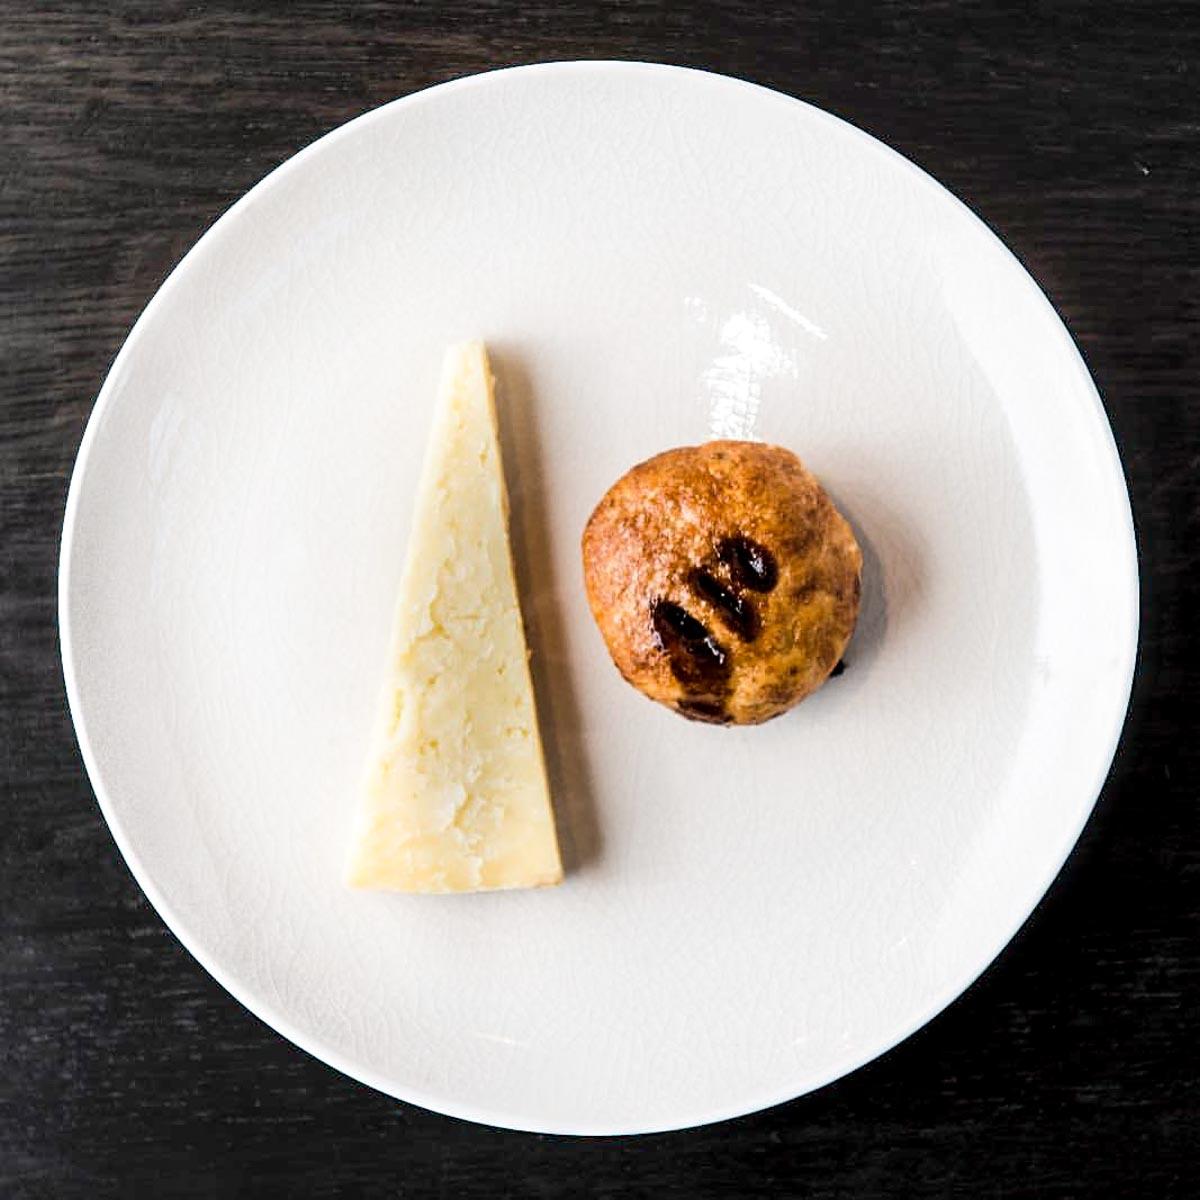 Eccles Cake & Lancashire Cheese | Photograph courtesy of St. John Restaurant